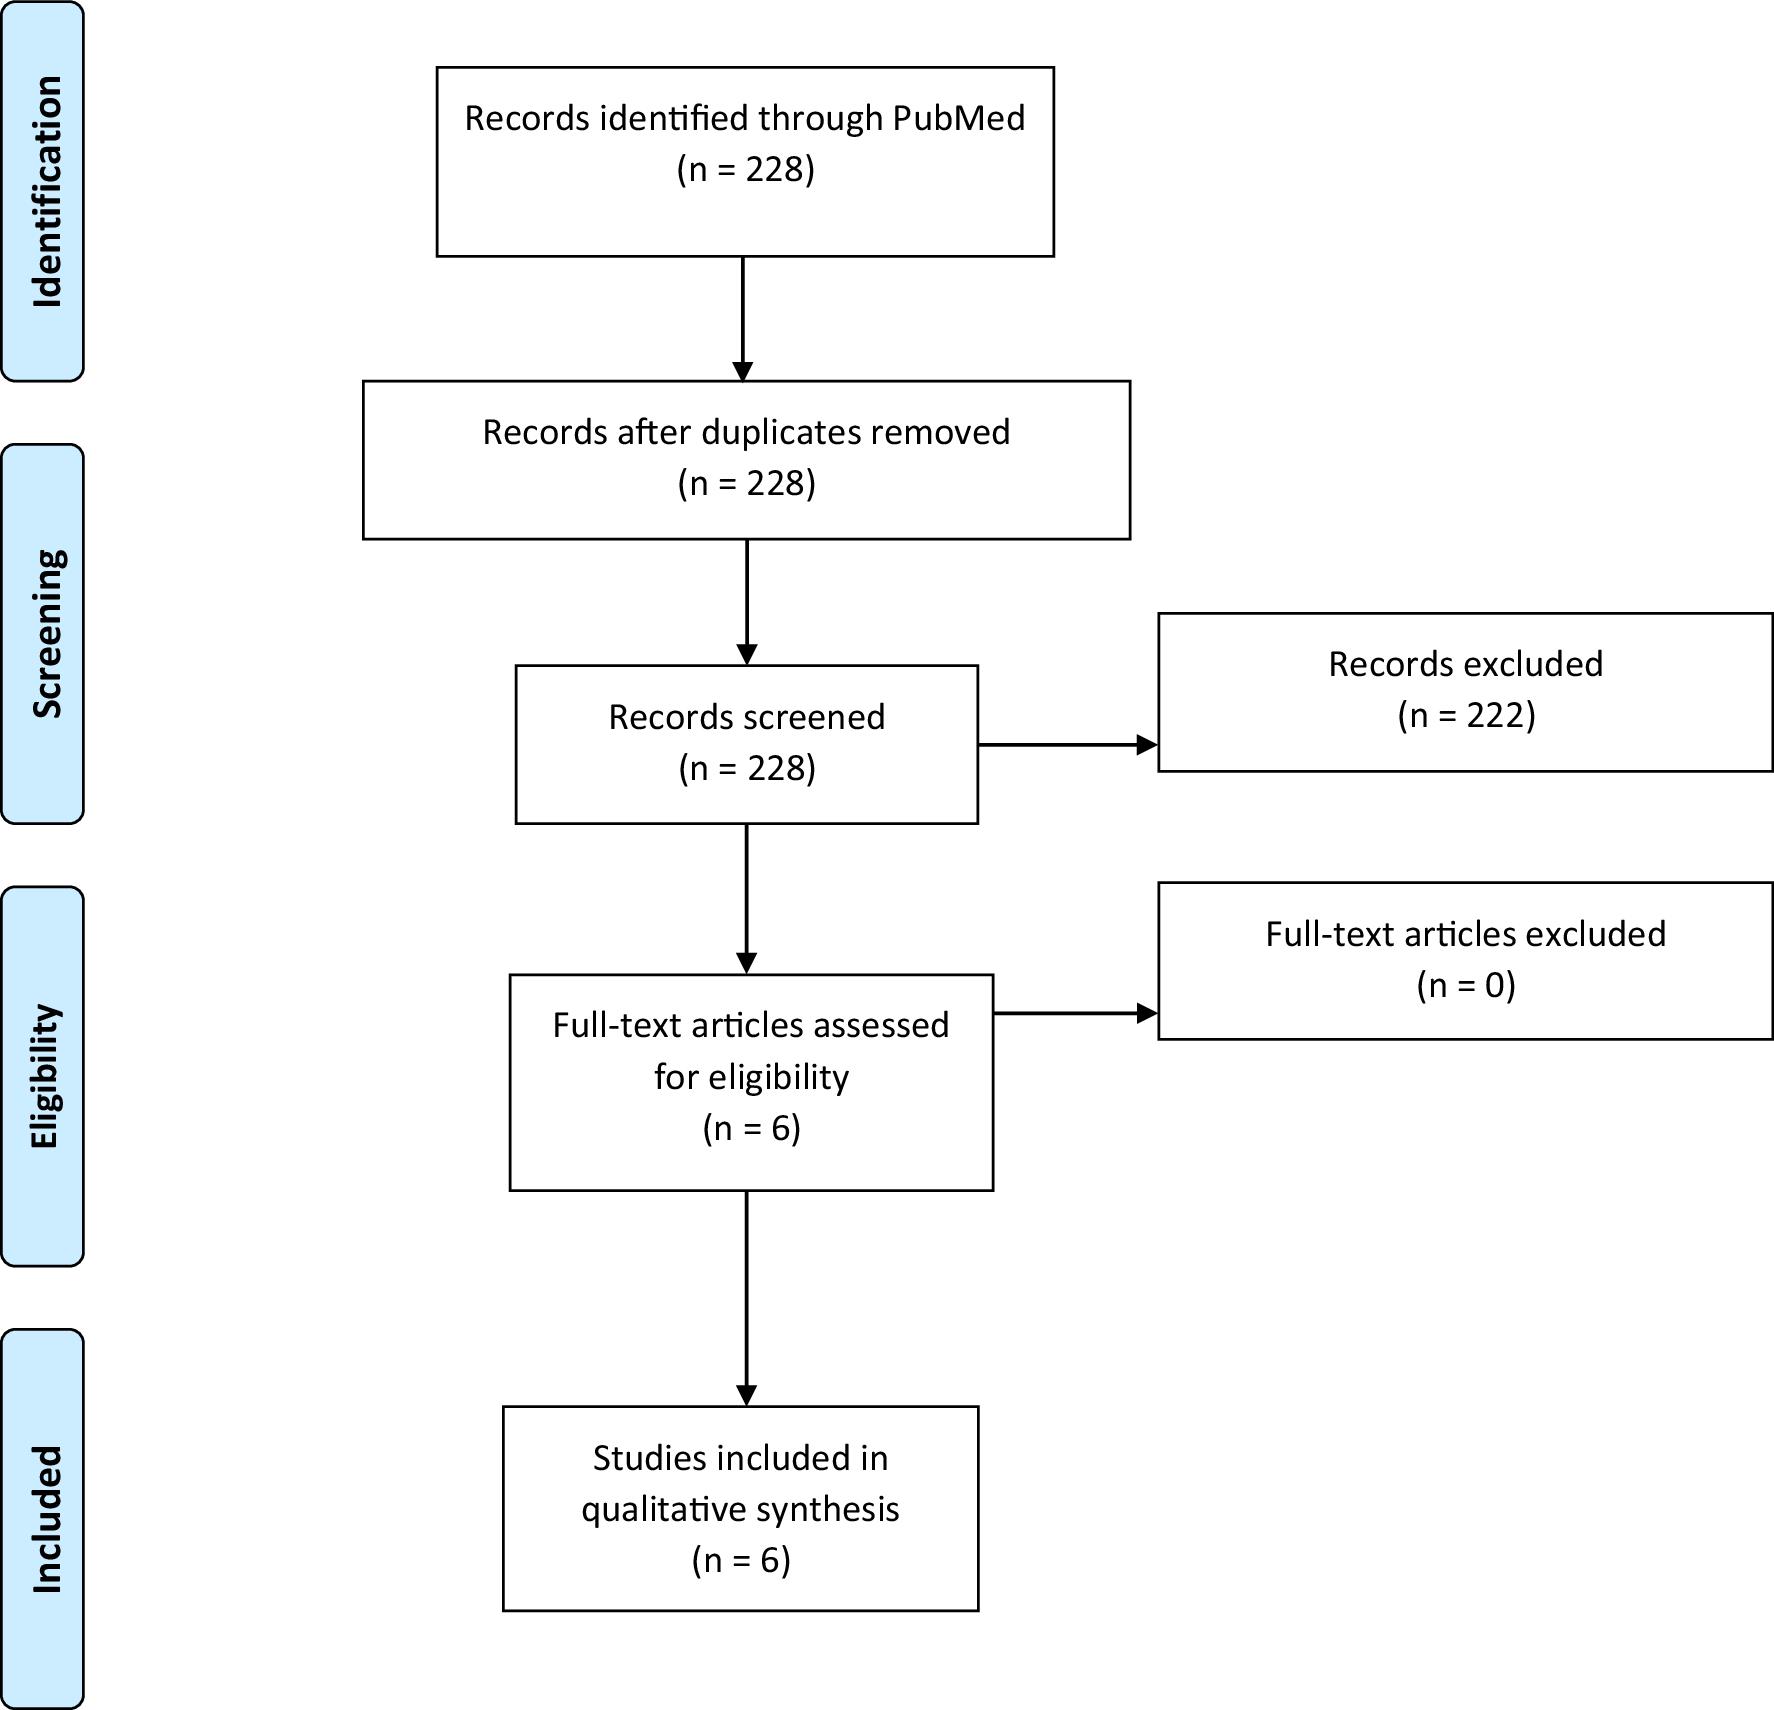 Management of Anticoagulation with Impella® Percutaneous